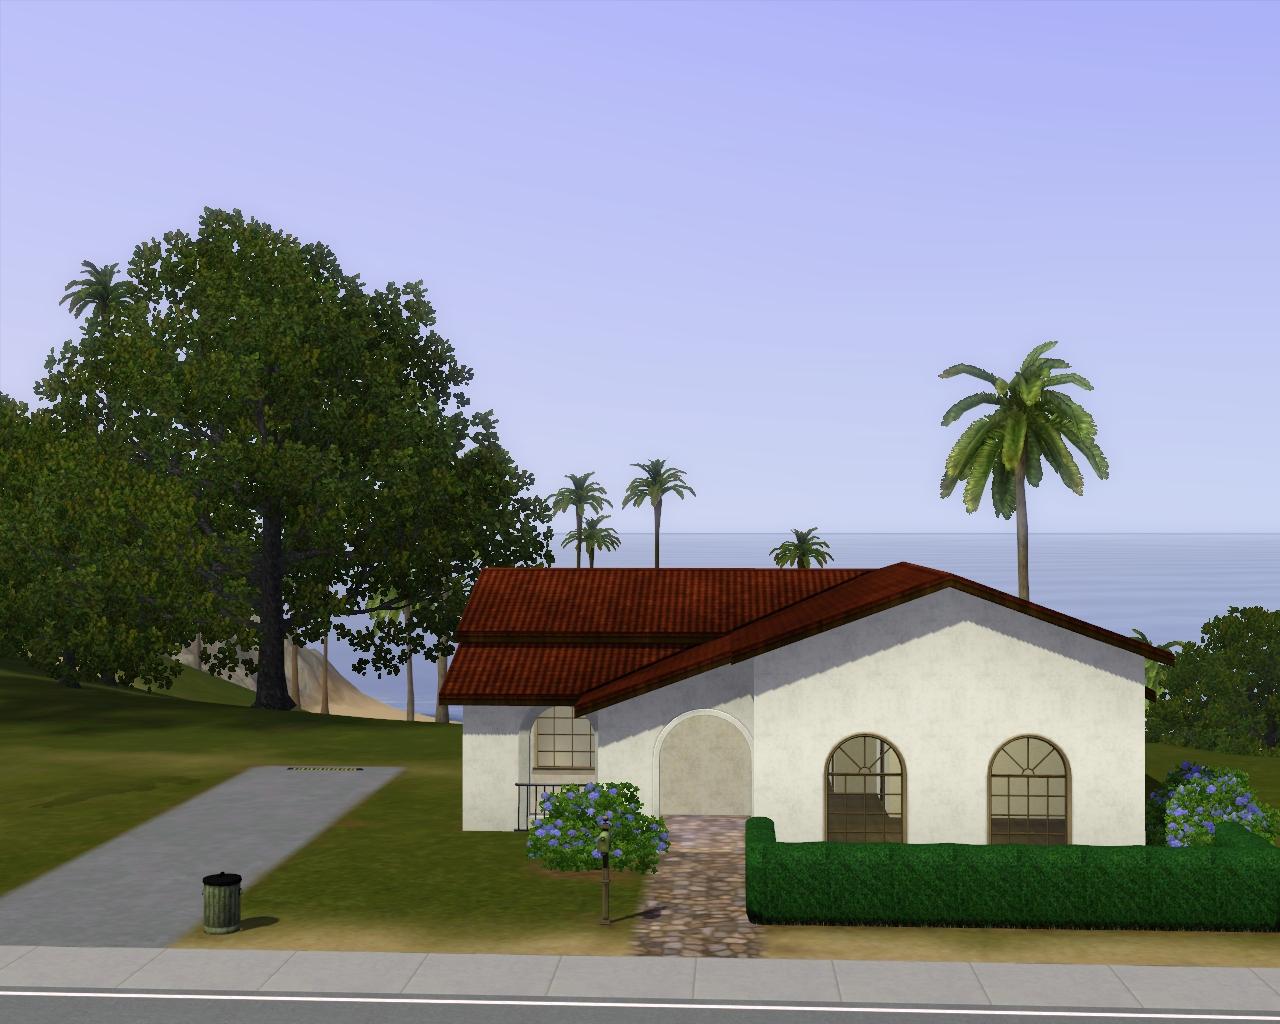 Summer 39 s little sims 3 garden starlight shores the sims for Minimalist house list